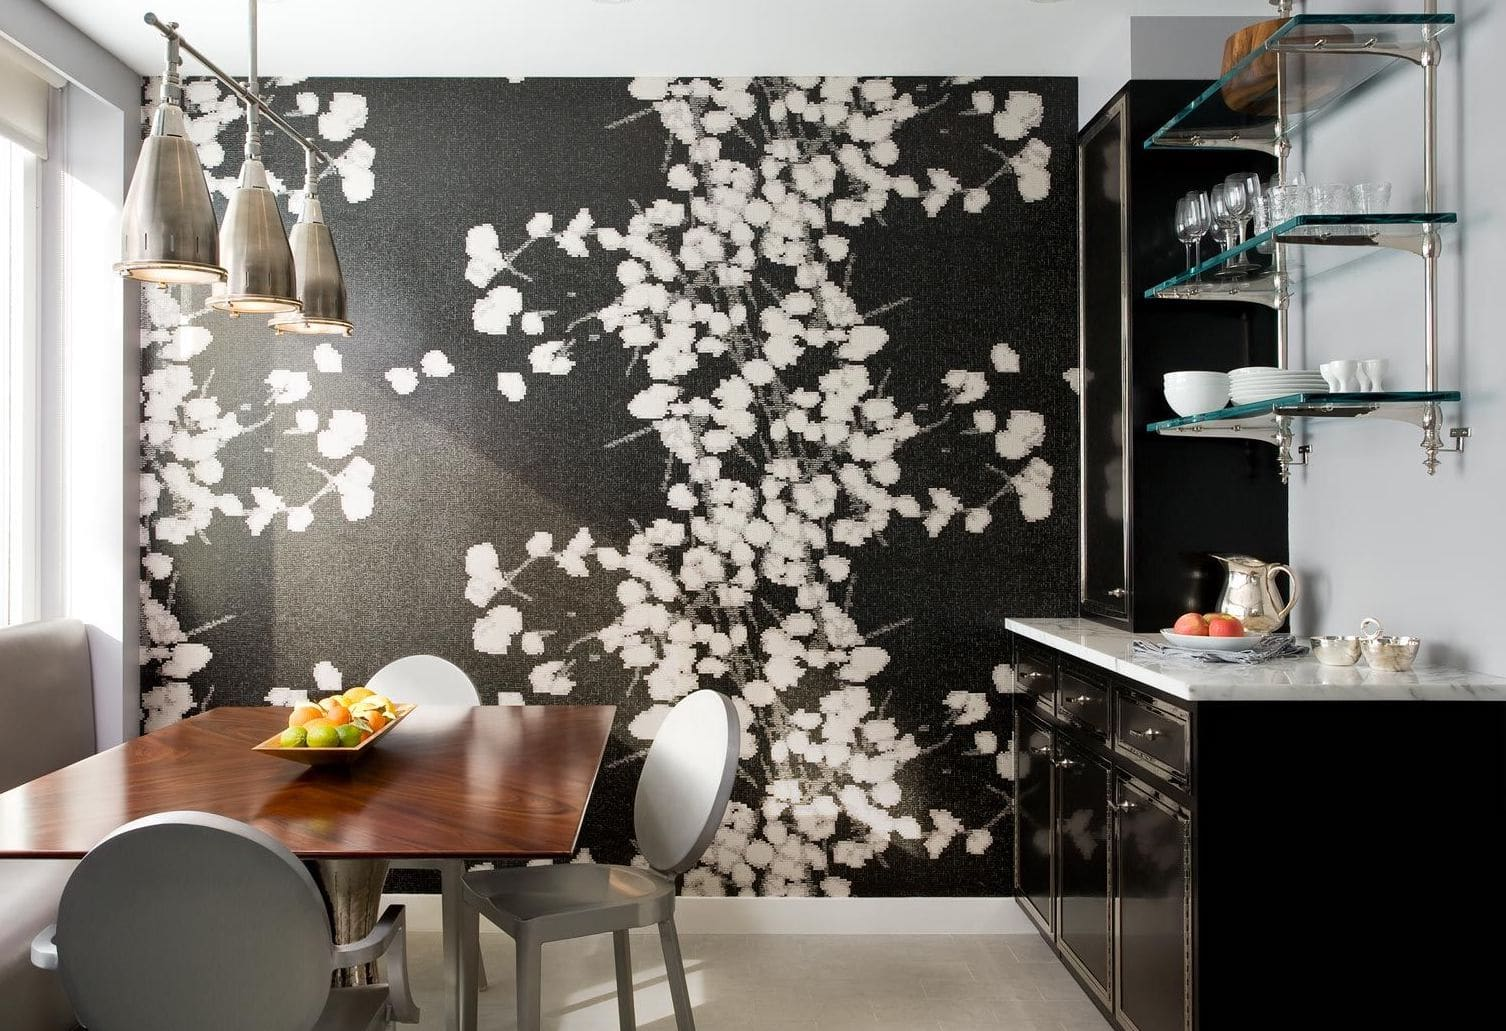 darci hether new york westchester hamptons in-home bar area interior design flower wall mural